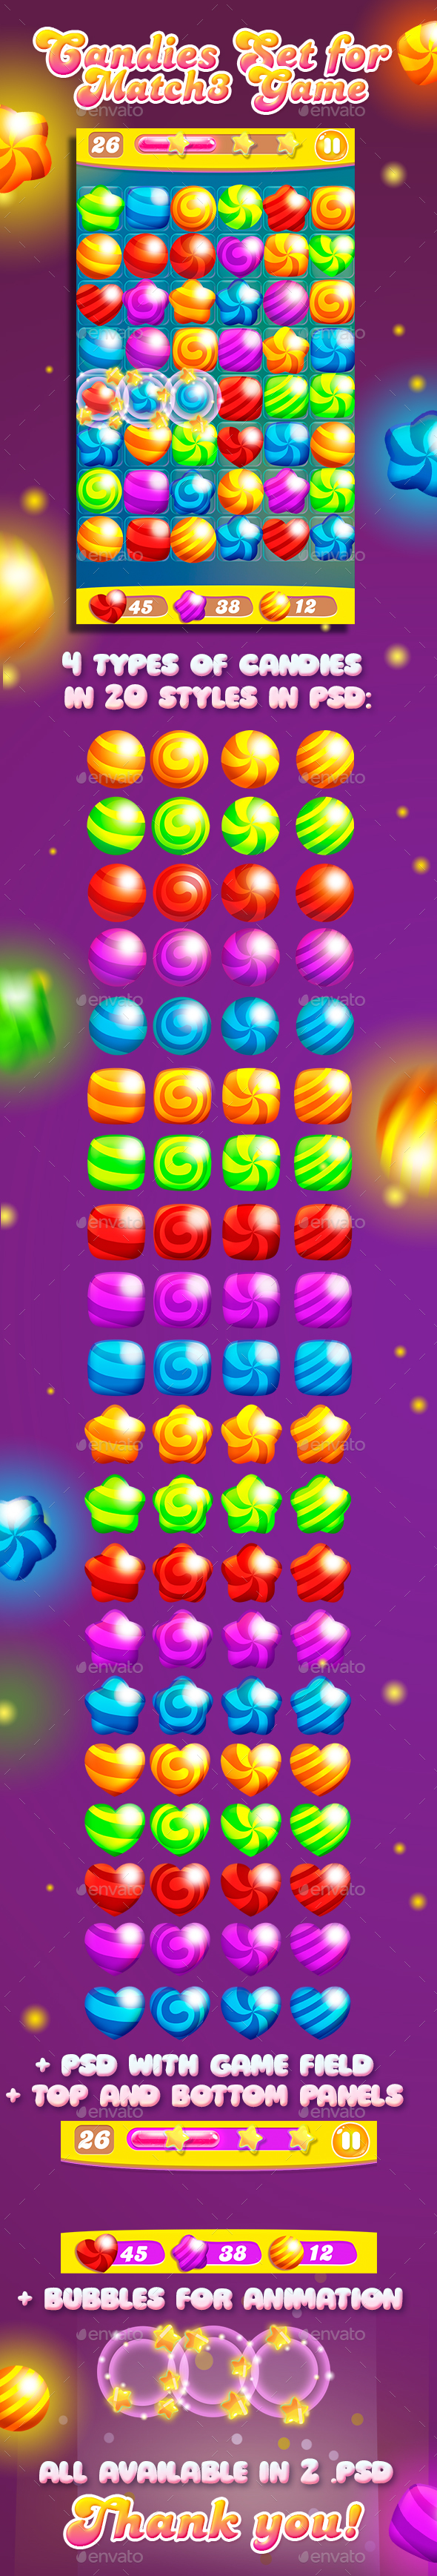 Big Match-3 Puzzle Game Gems Set - Game Kits Game Assets